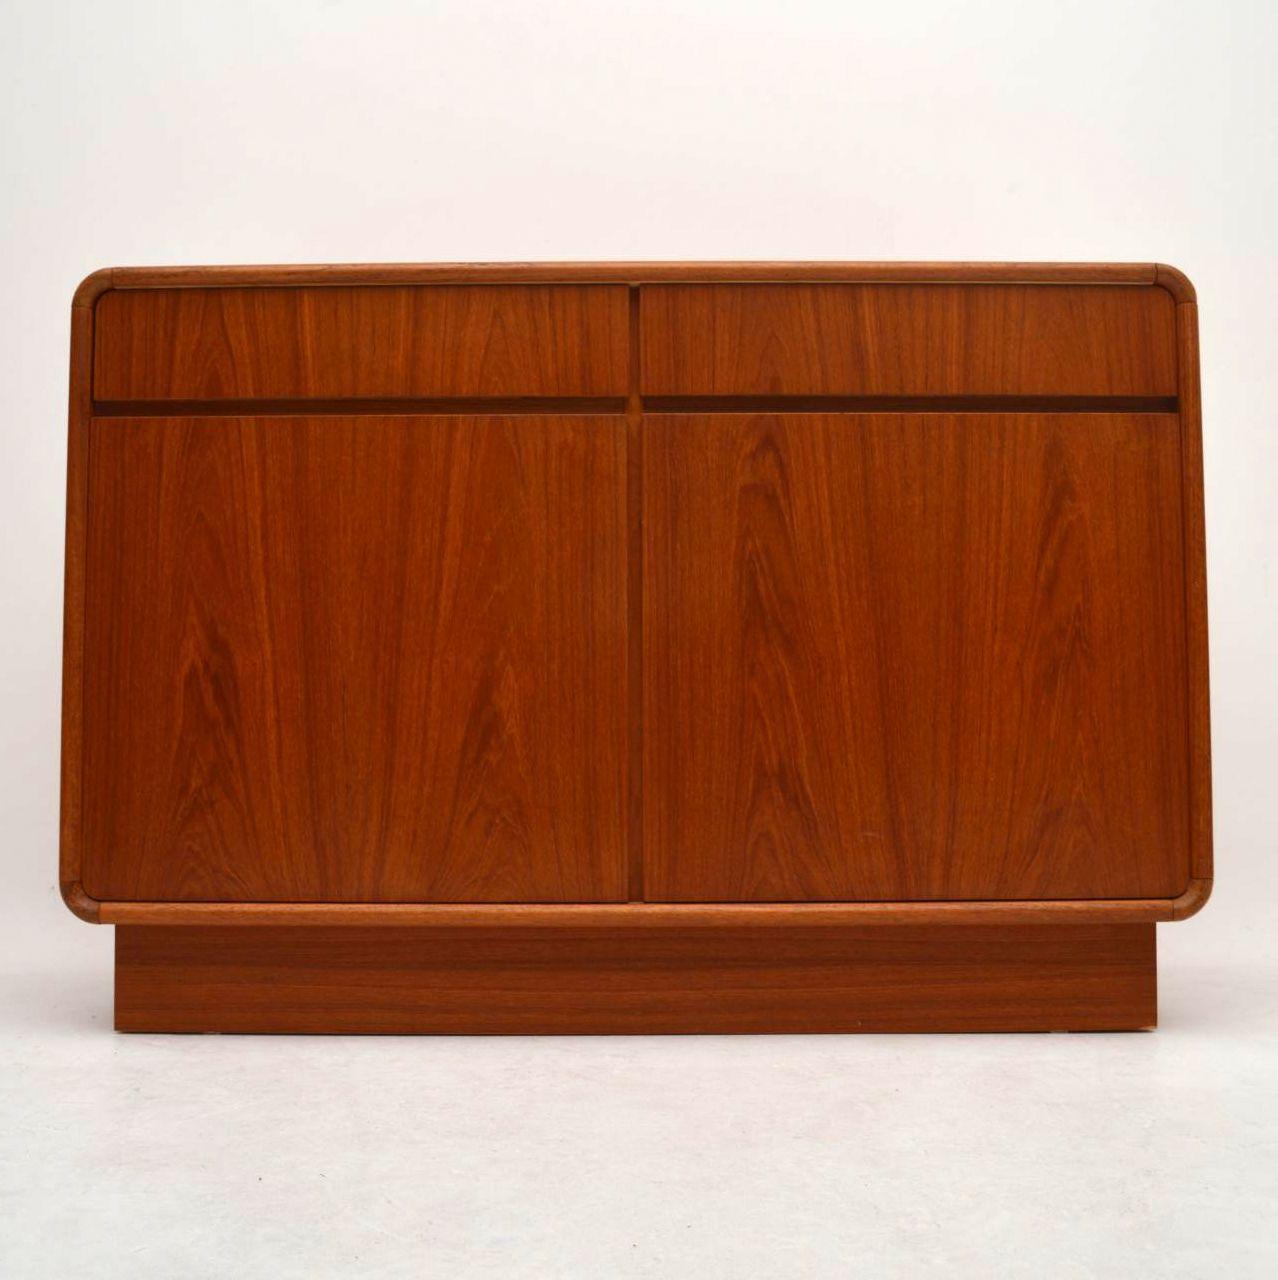 Danish Teak Retro Sideboard Vintage 1970 S Retrospective